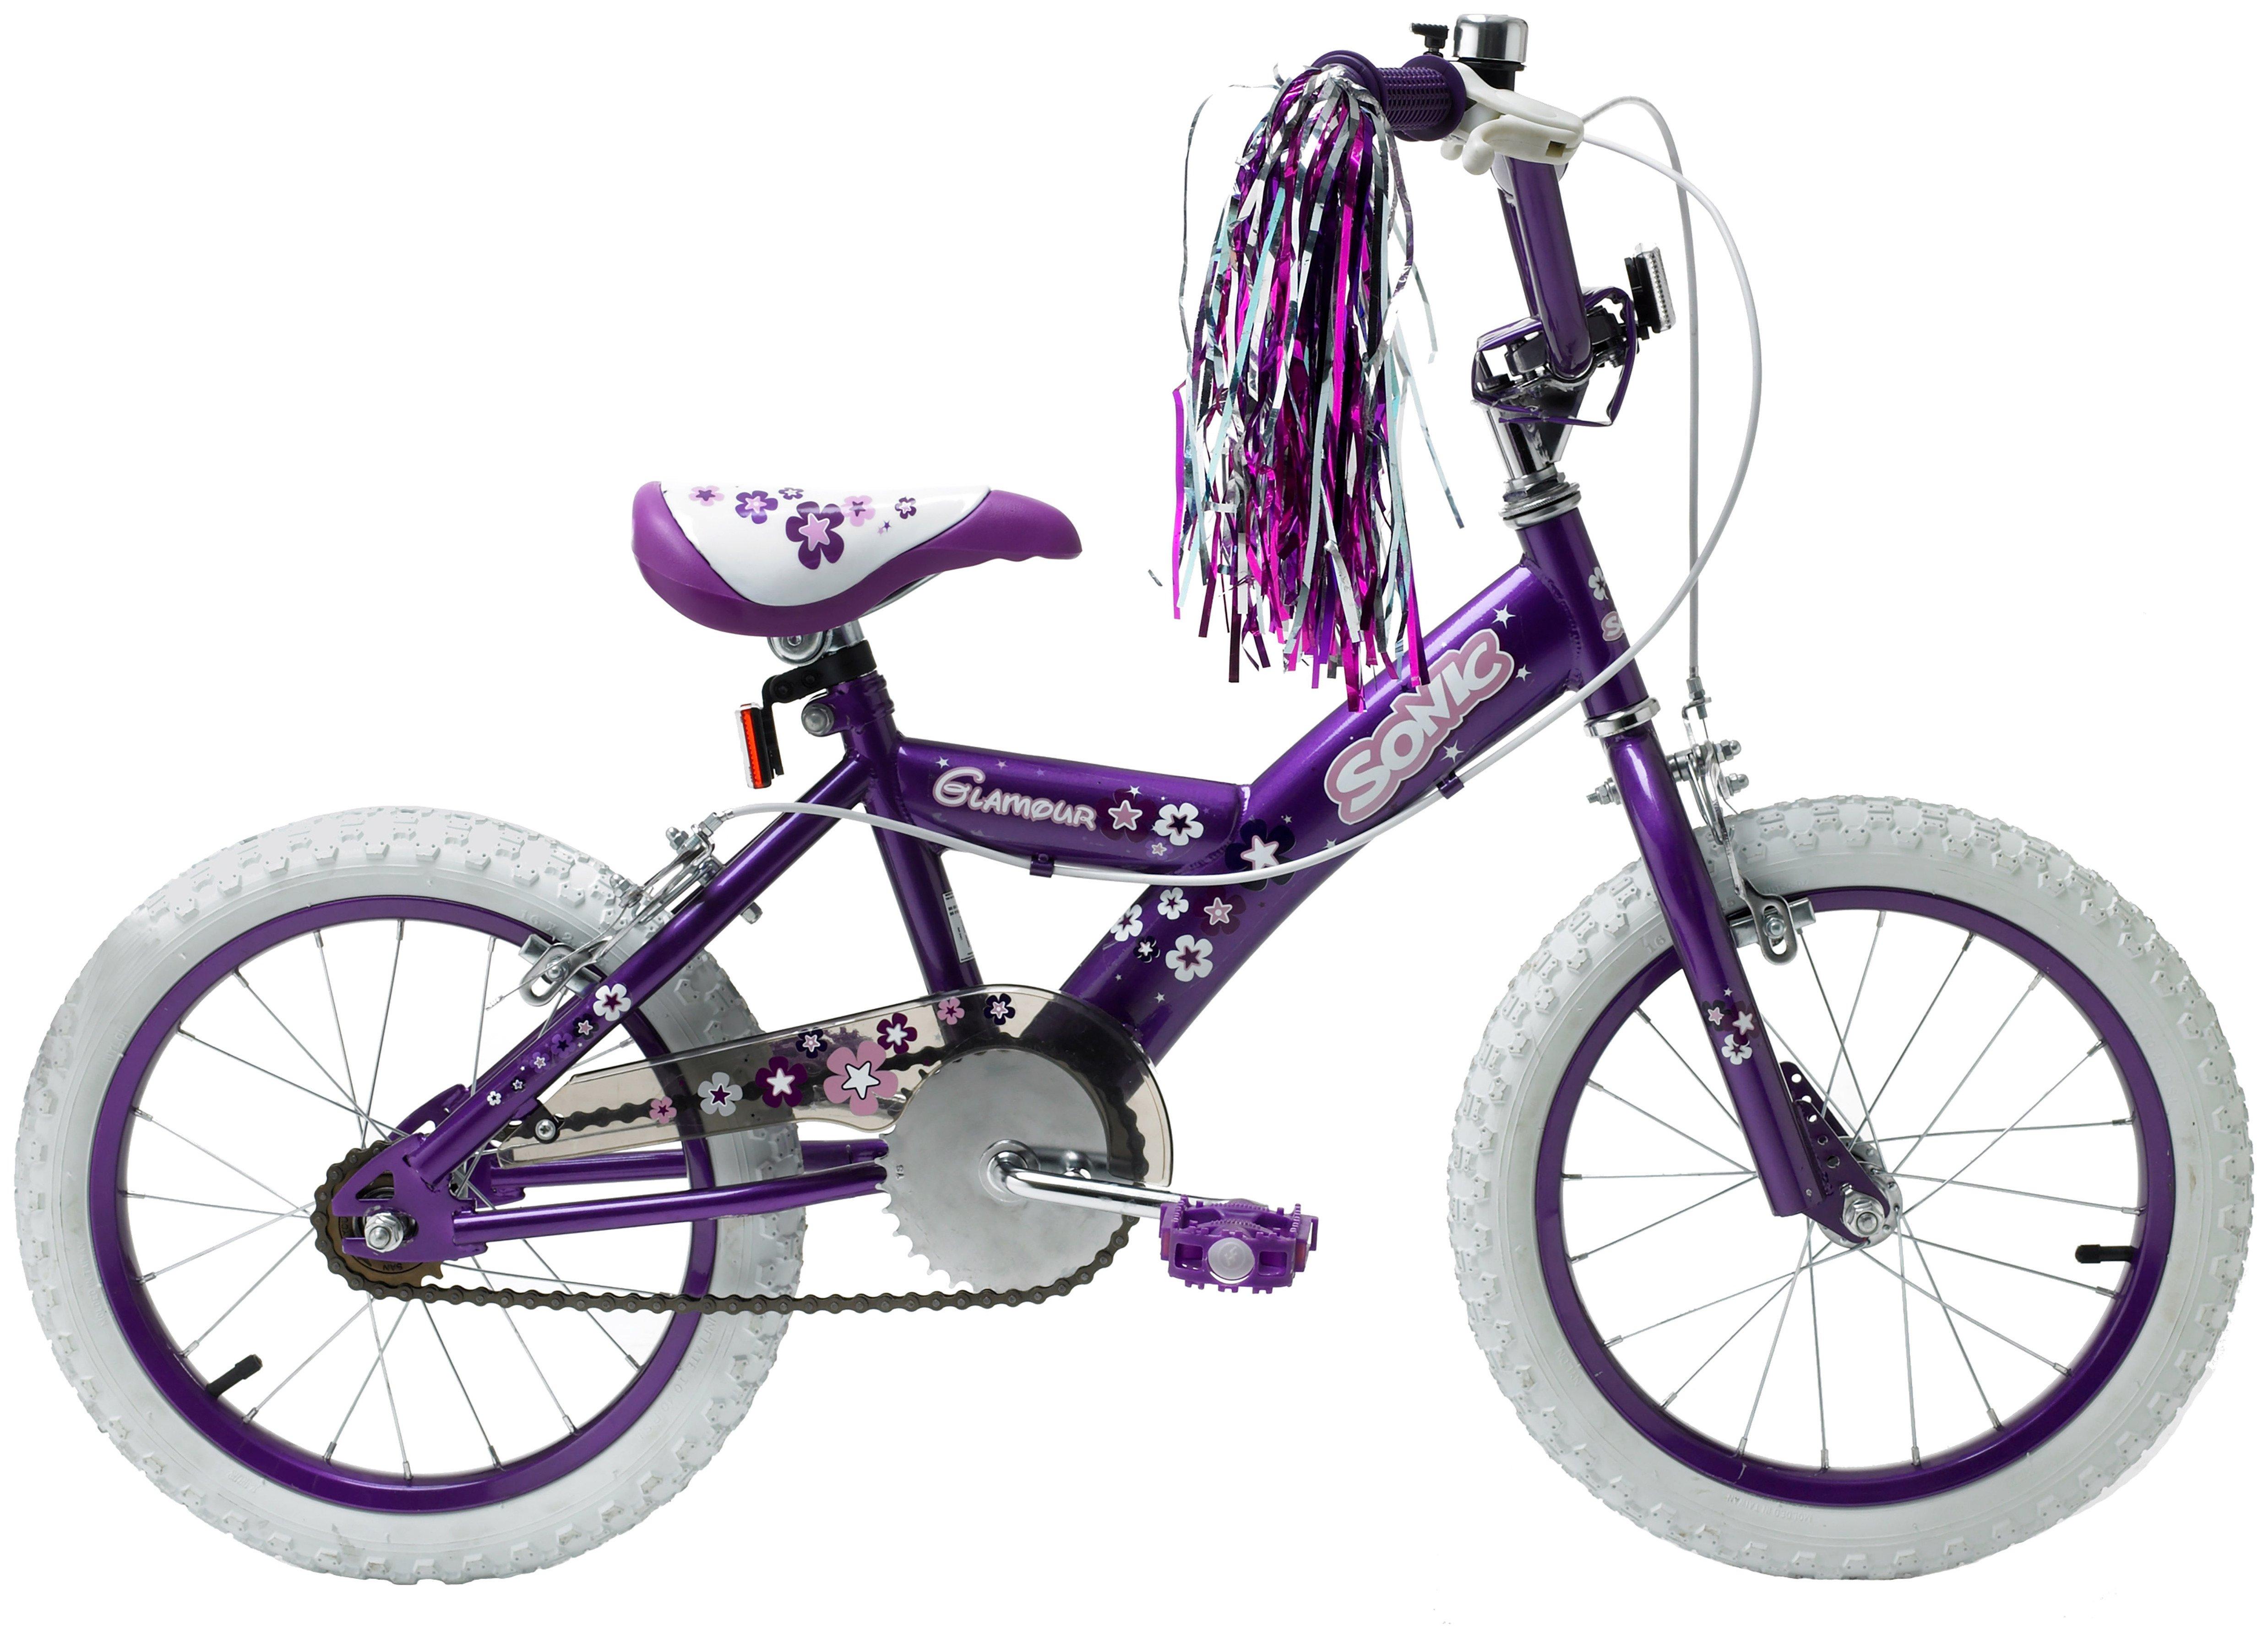 Sonic Glamour 16 Inch Bike - Kids